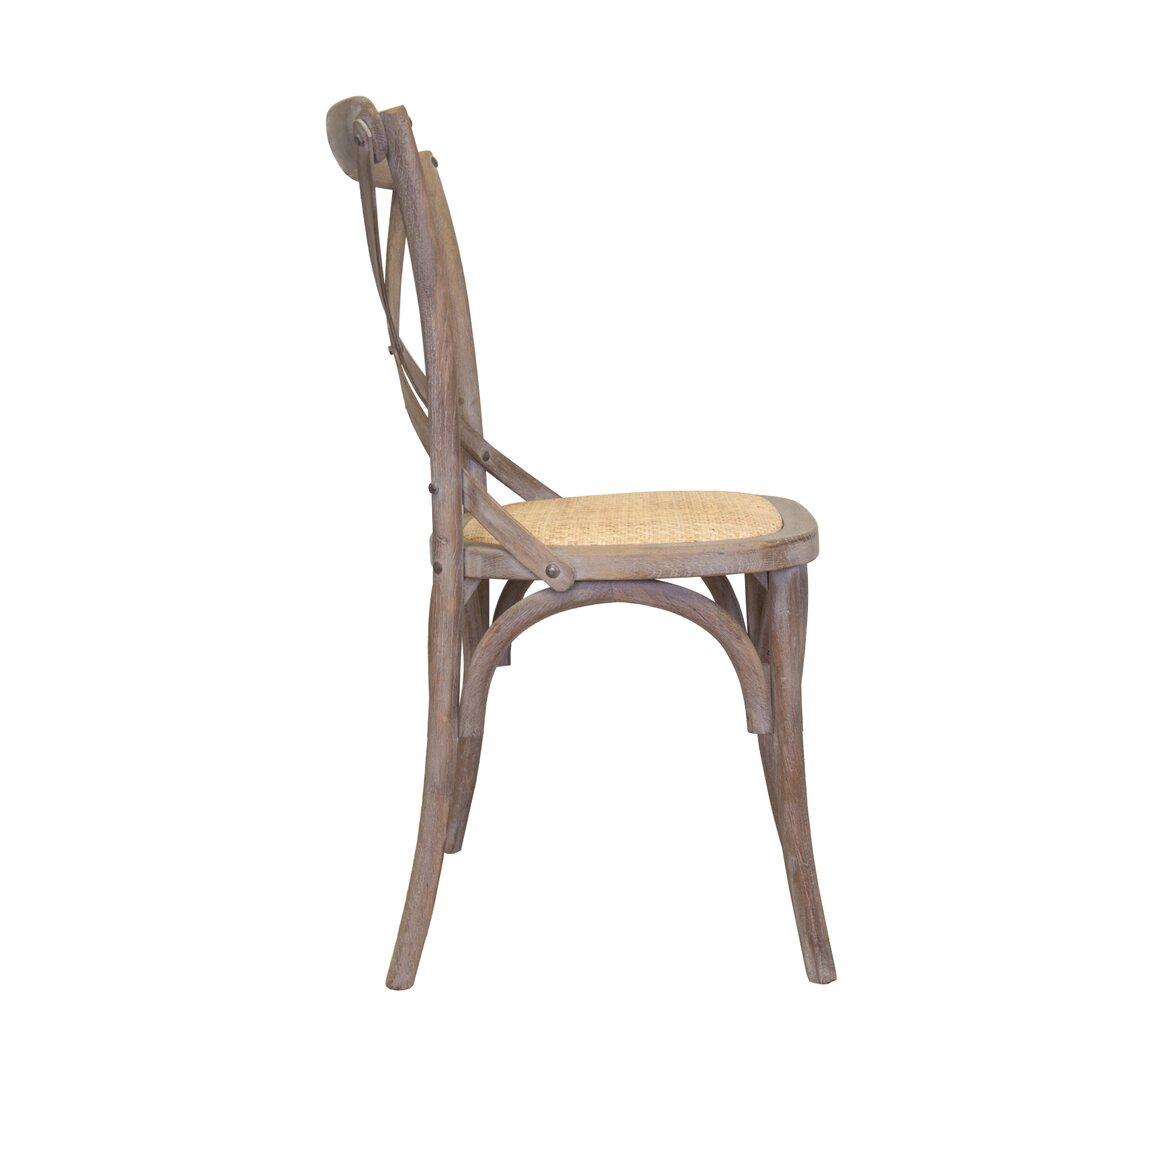 Стул Cross back old 2 | Обеденные стулья Kingsby